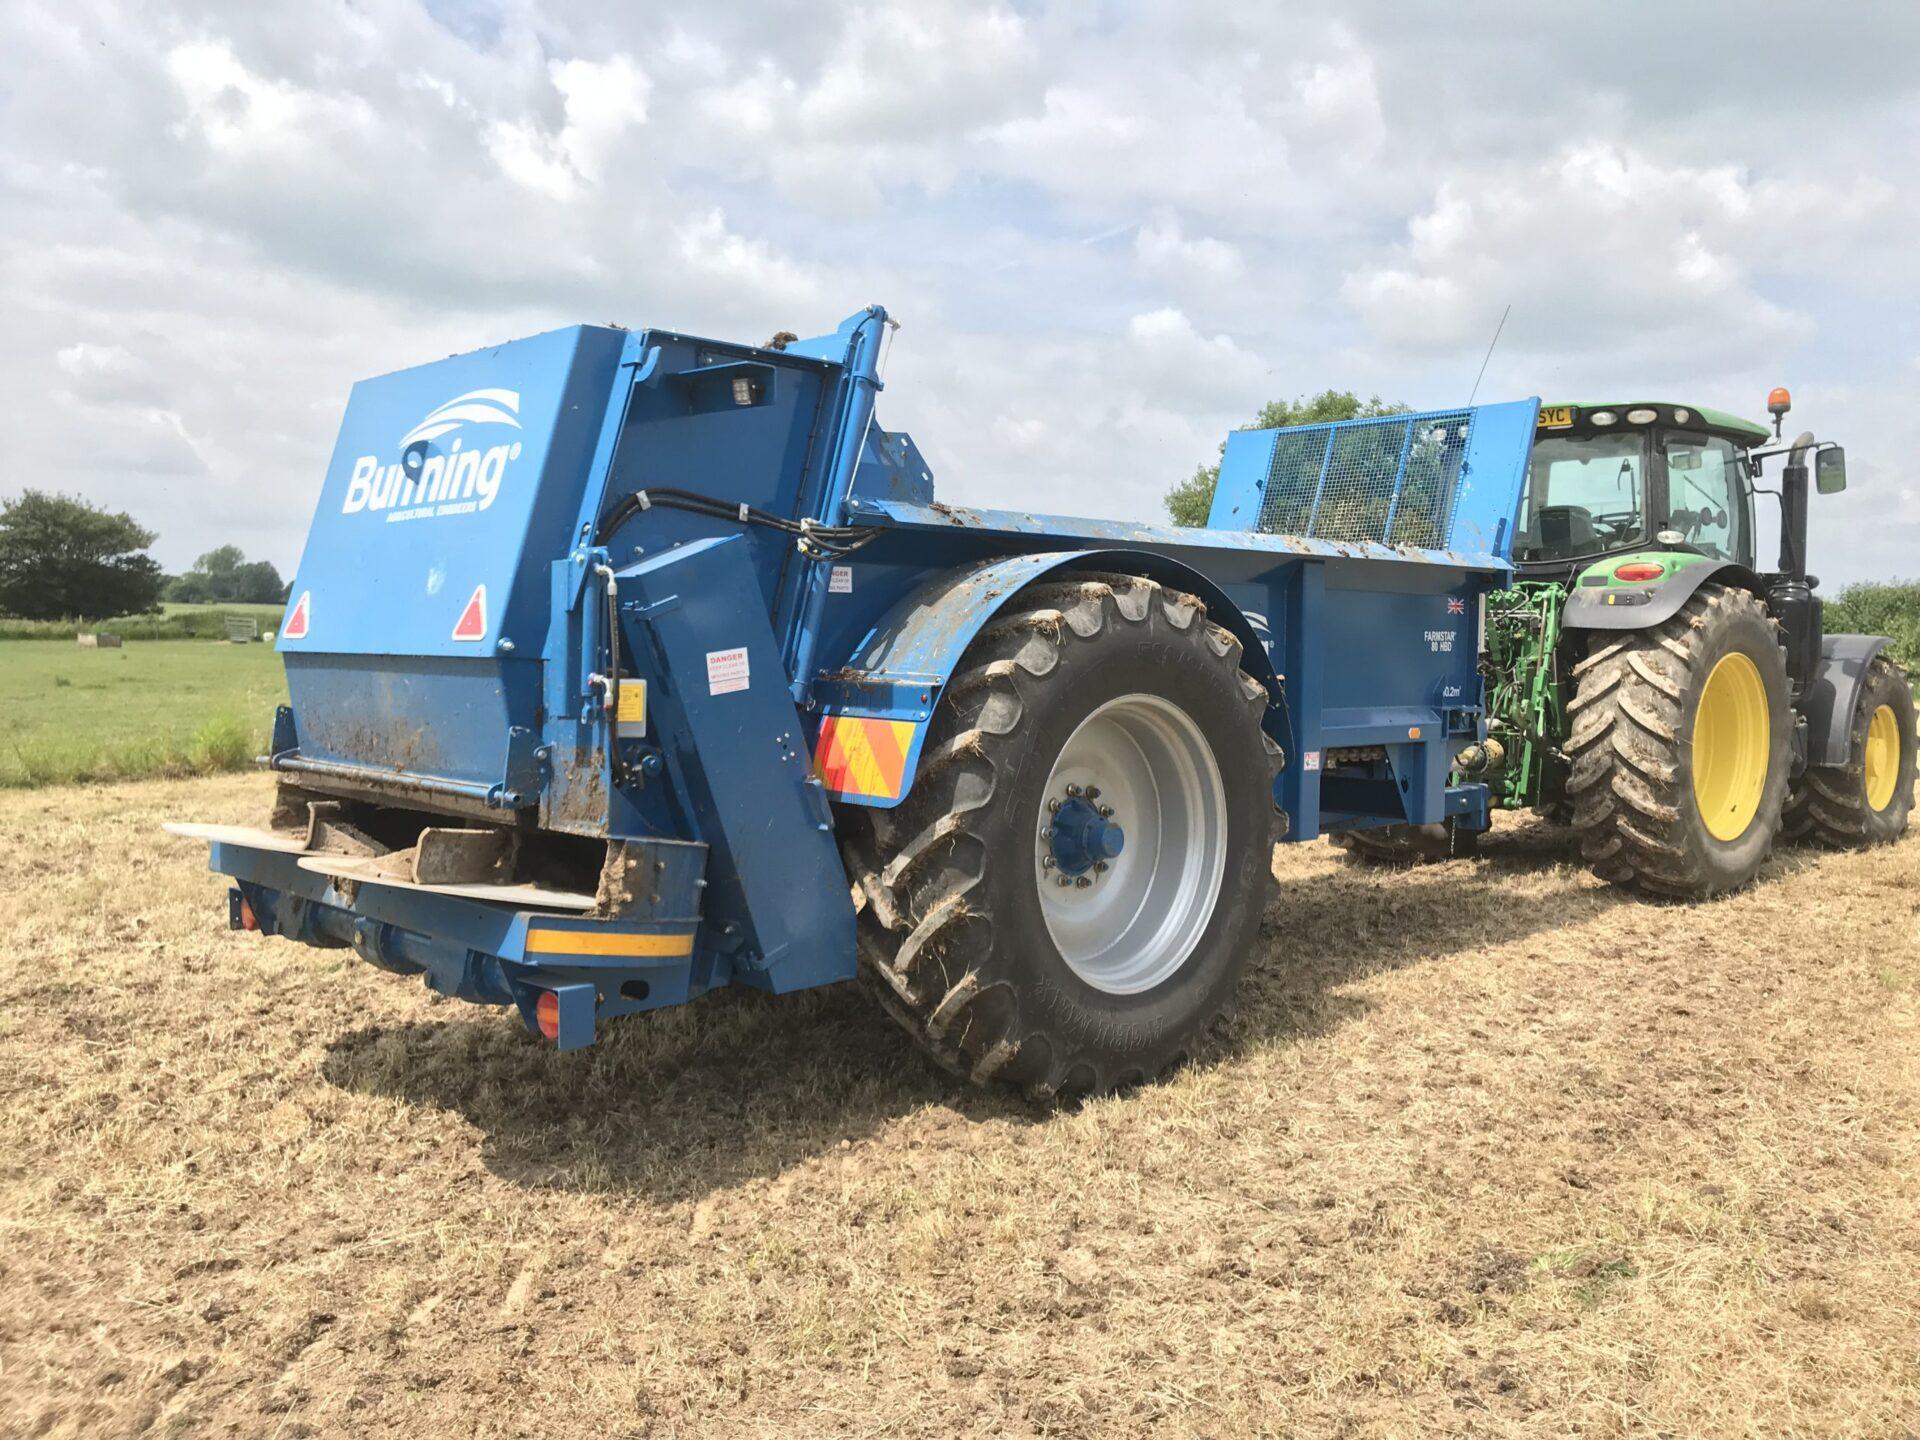 Farmstar 80 HBD